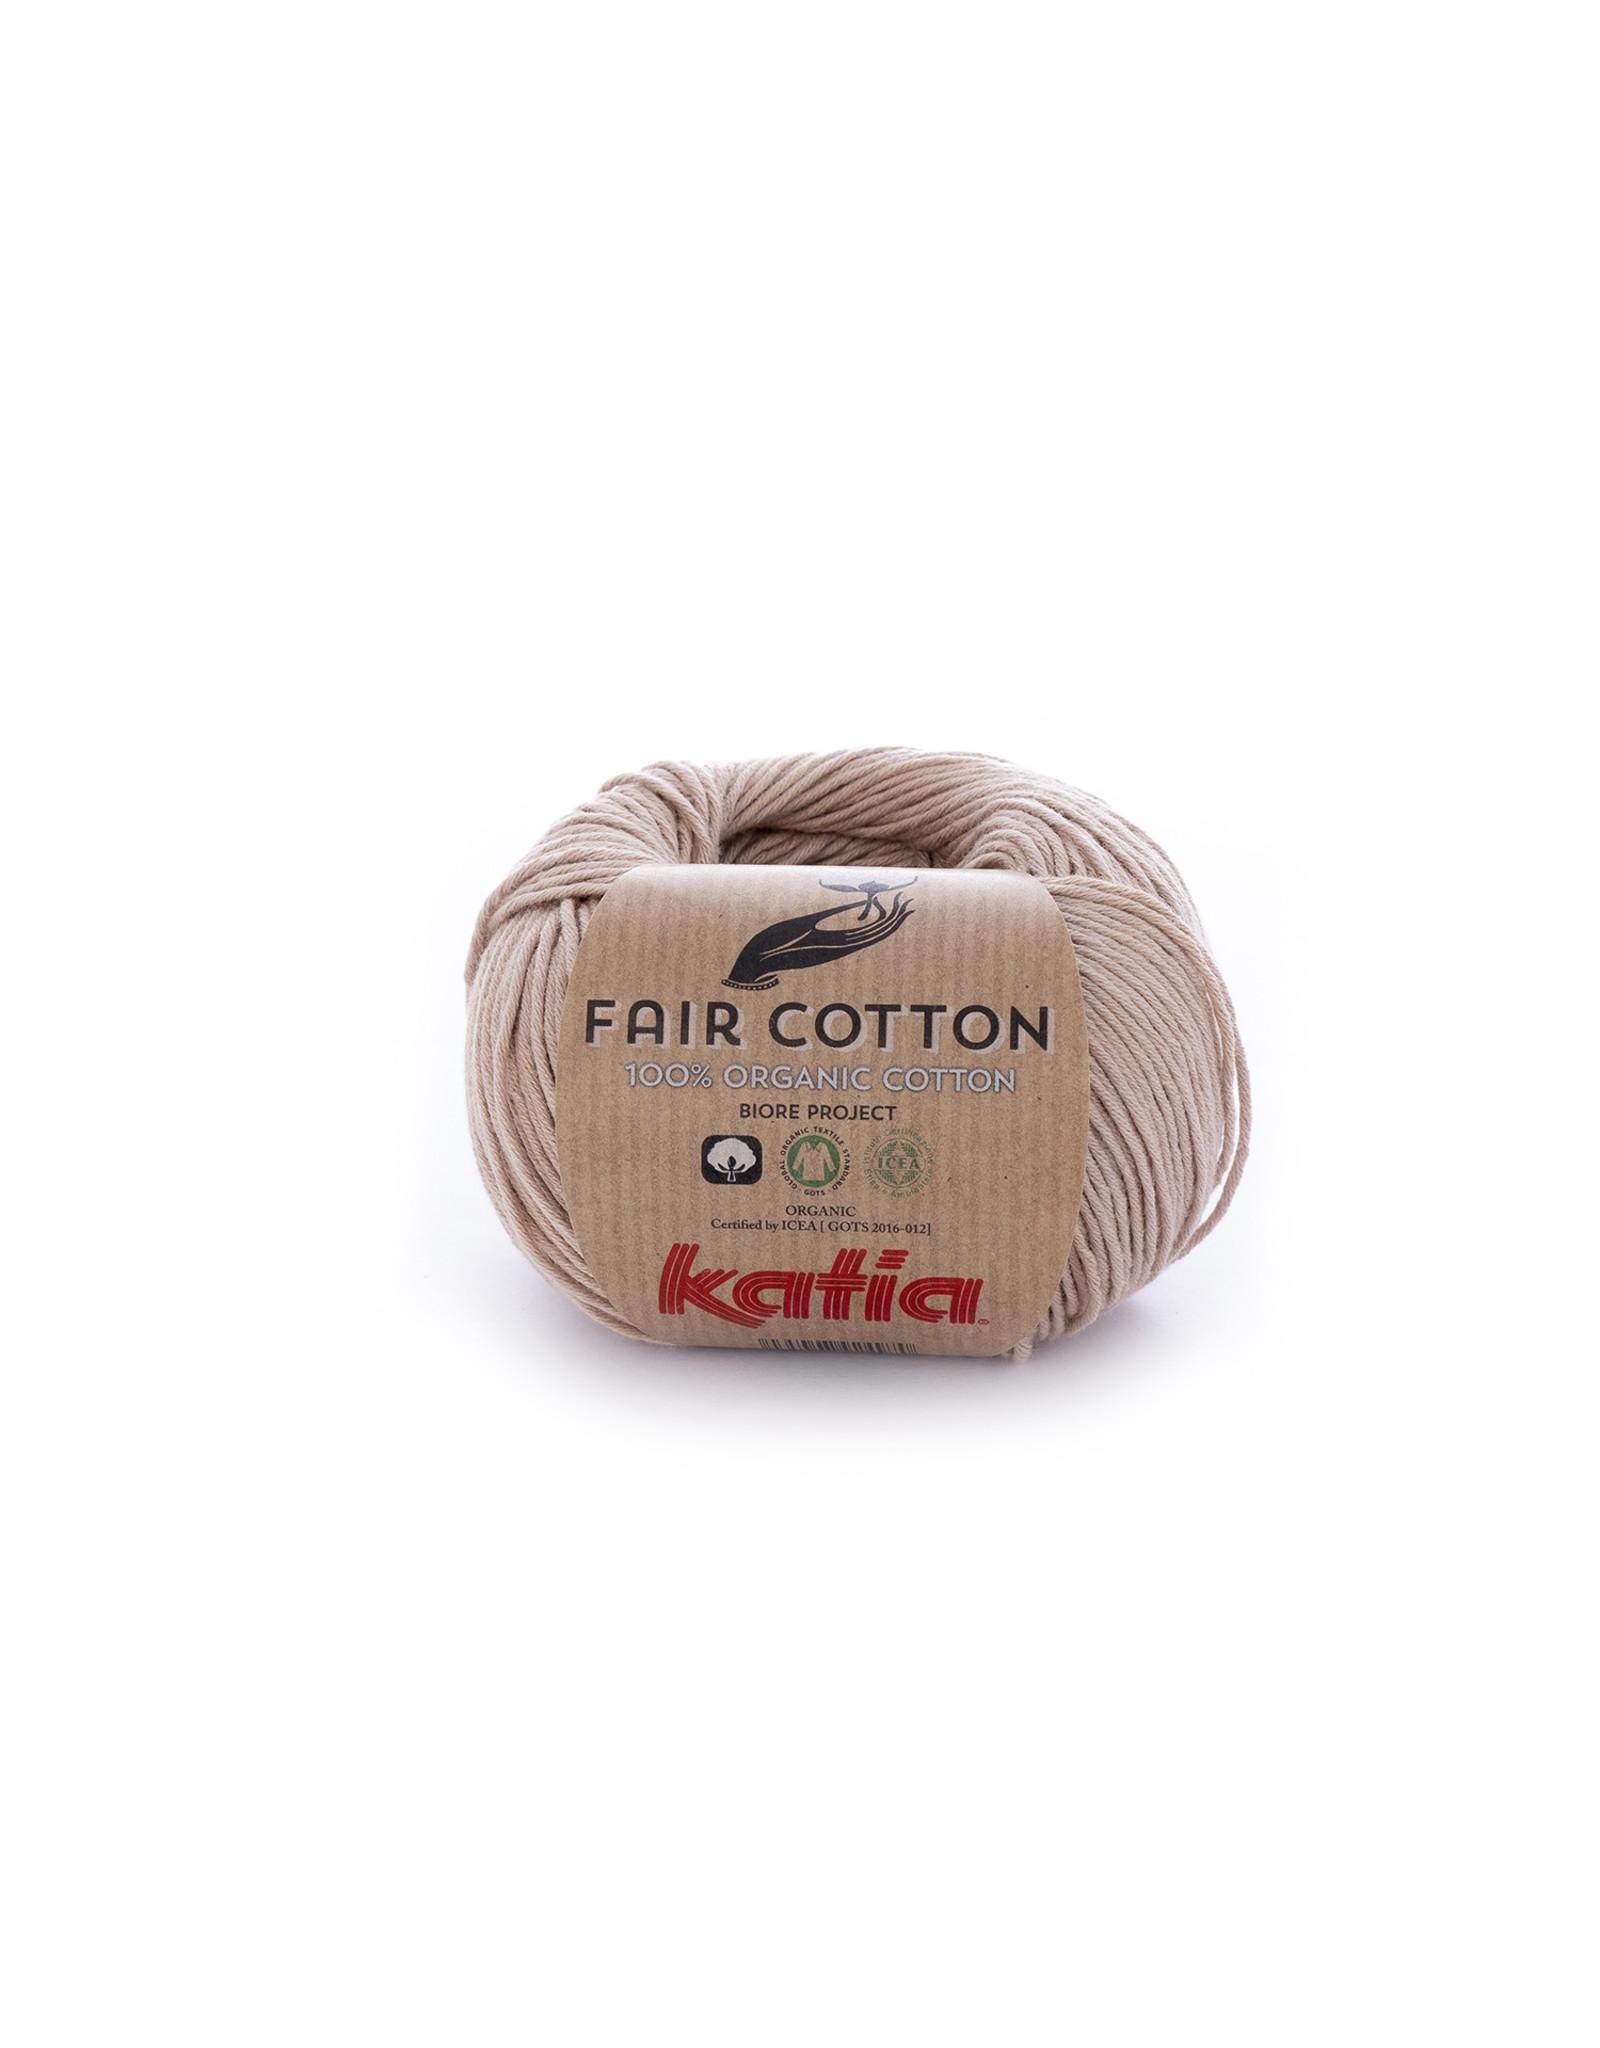 Katia Katia Fair Cotton 12 - sepiabruin - 50 gr. - 100% biol. katoen